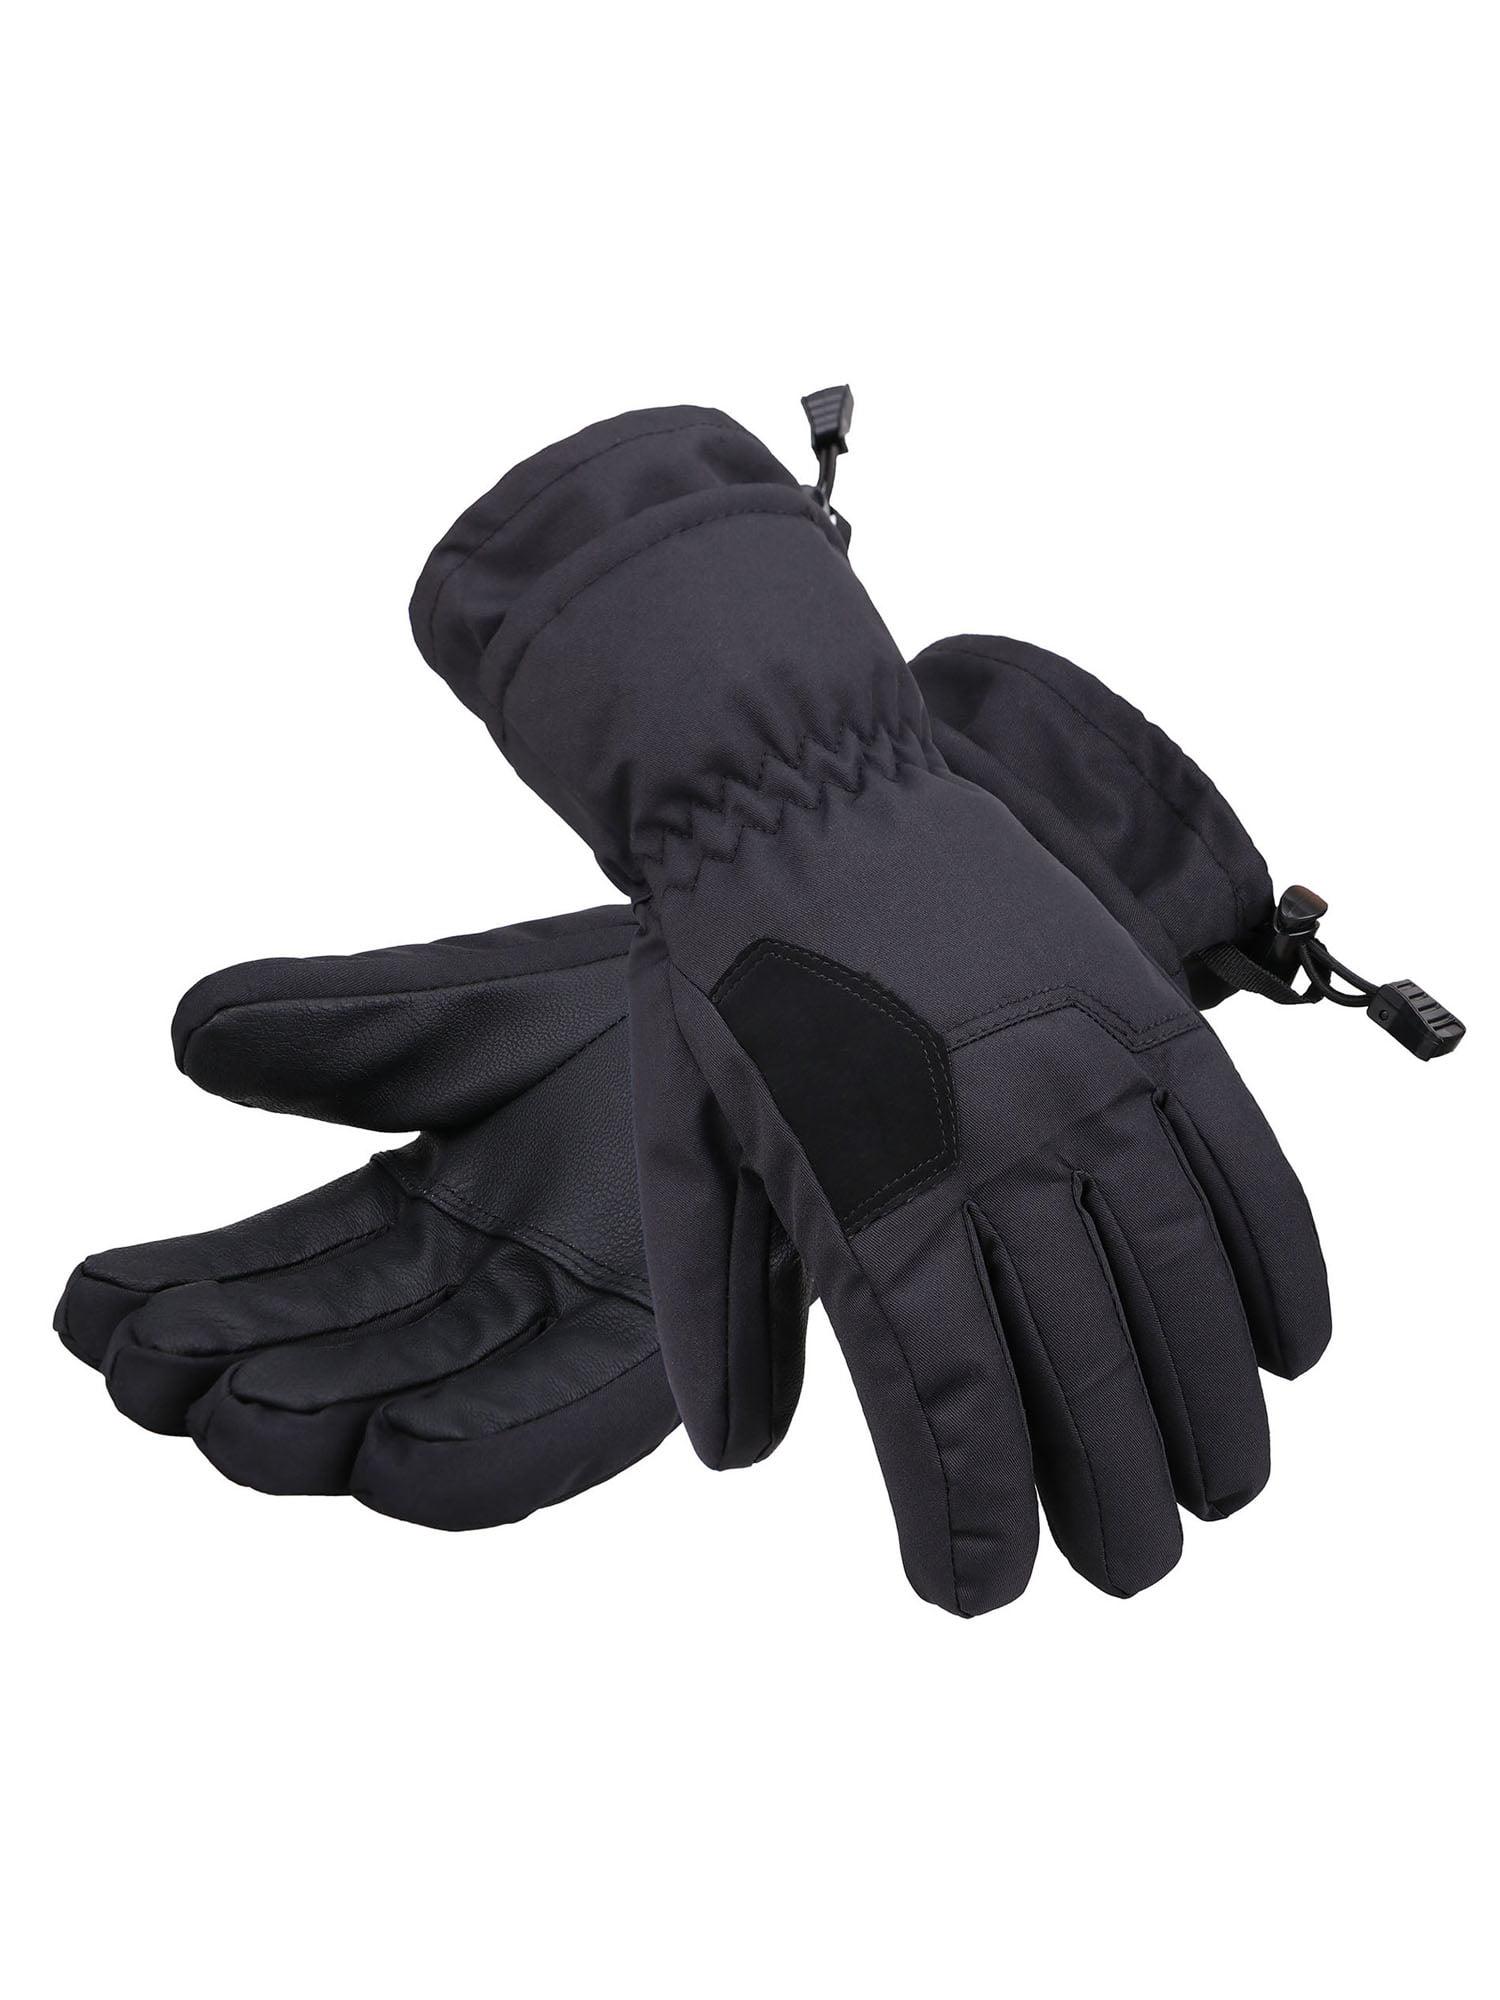 Lullaby Kids Ski Gloves Insulation Winter Mittens Waterproof Windproof S